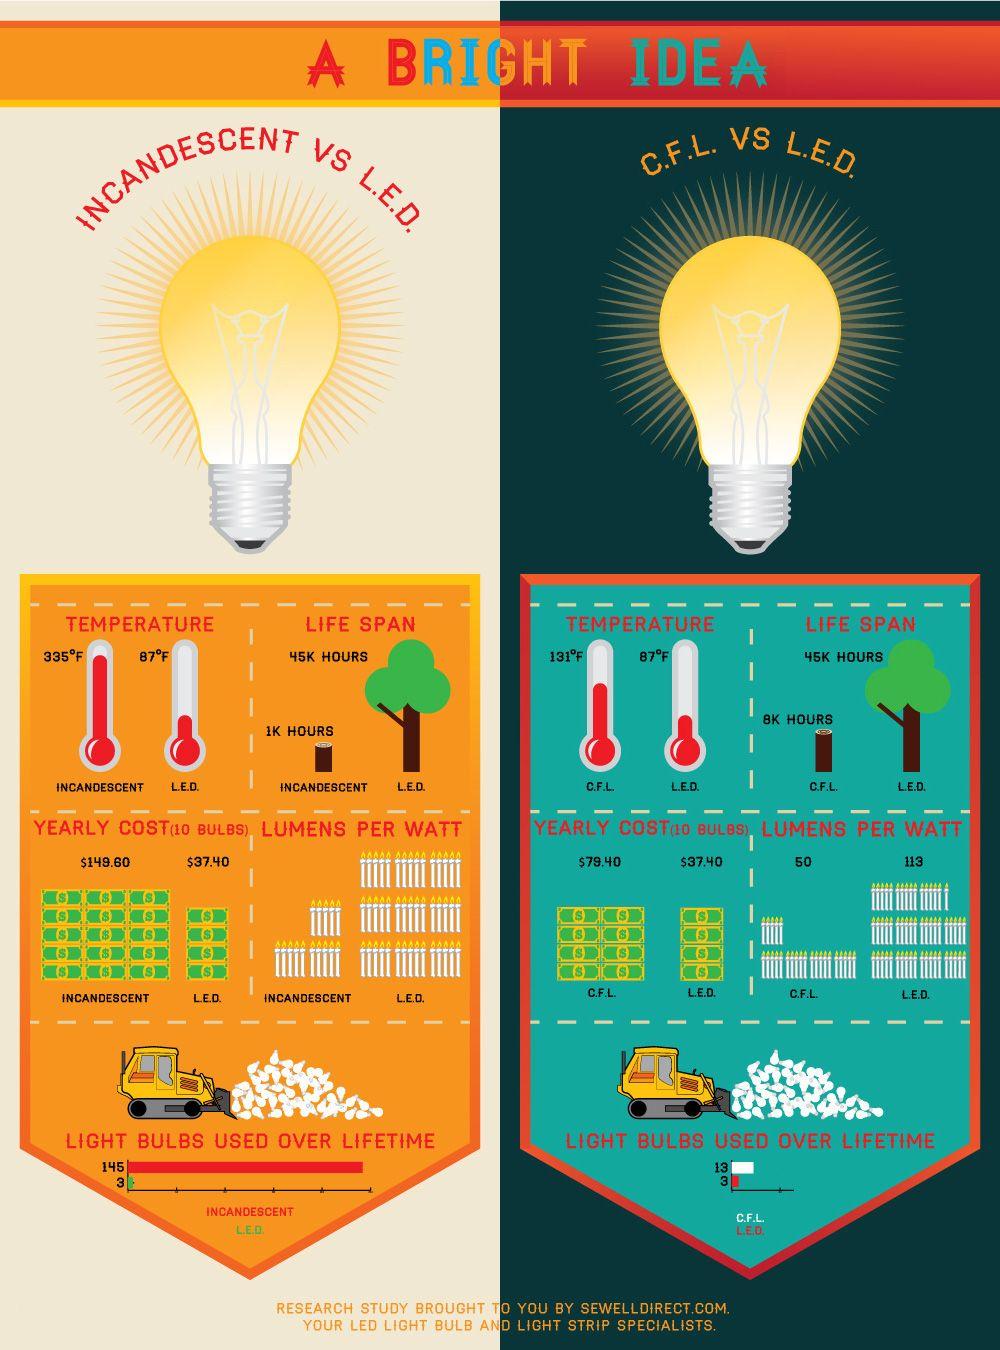 Not great, but relevant info. Incandescent vs CFL vs LED ...